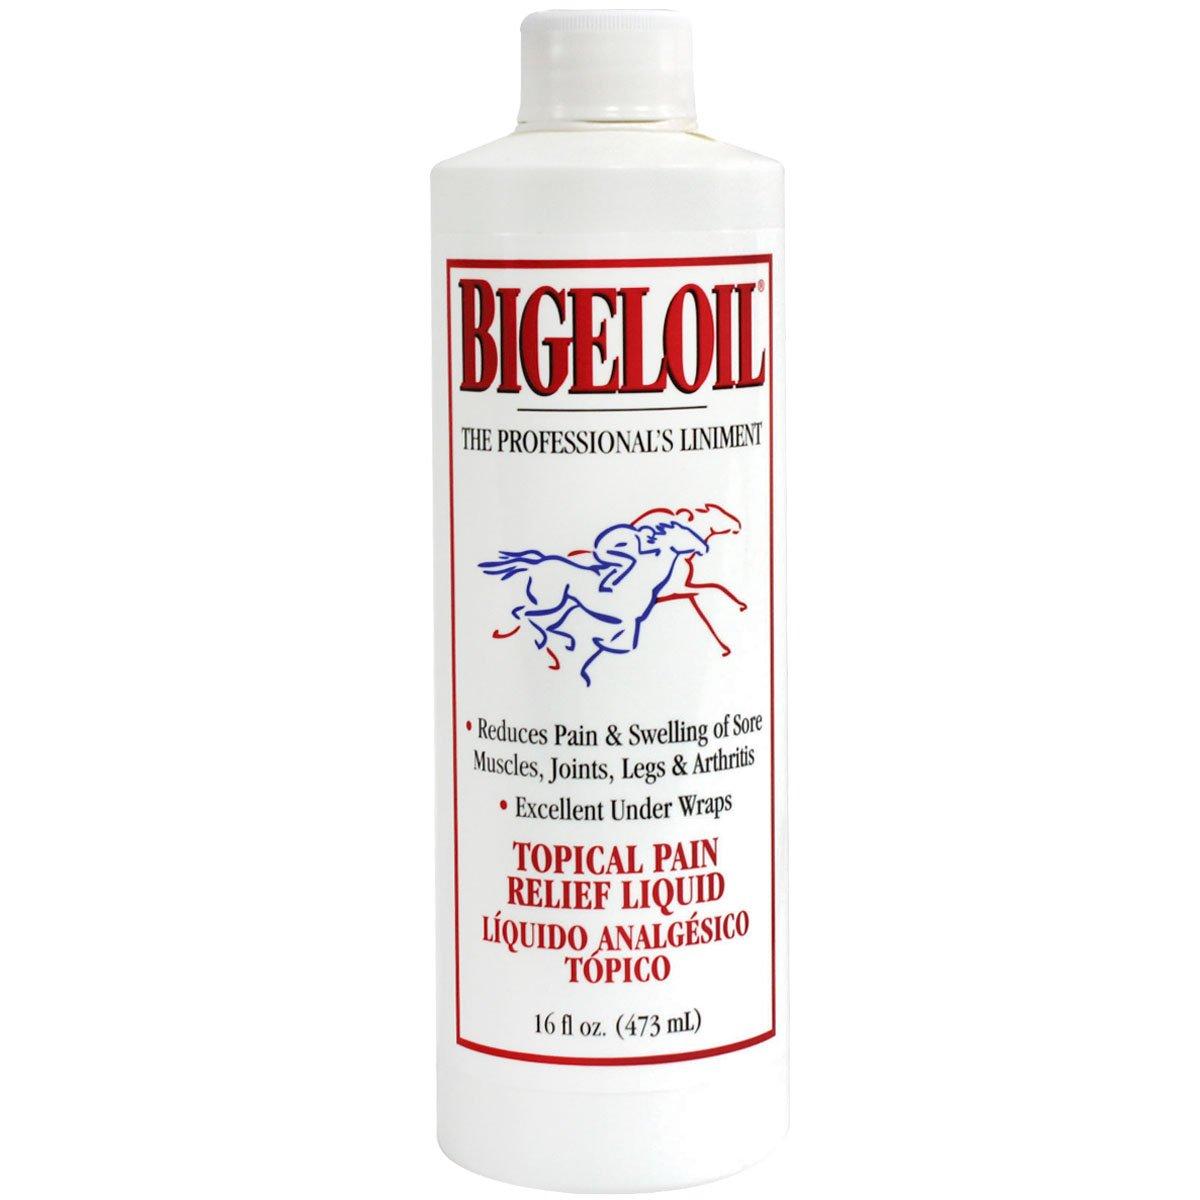 Bigeloil Absorbine Liniment 32 oz QT LIQUID Rub Pain Relief Sore Muscles Joints Arthritis Horse Sheep Cows